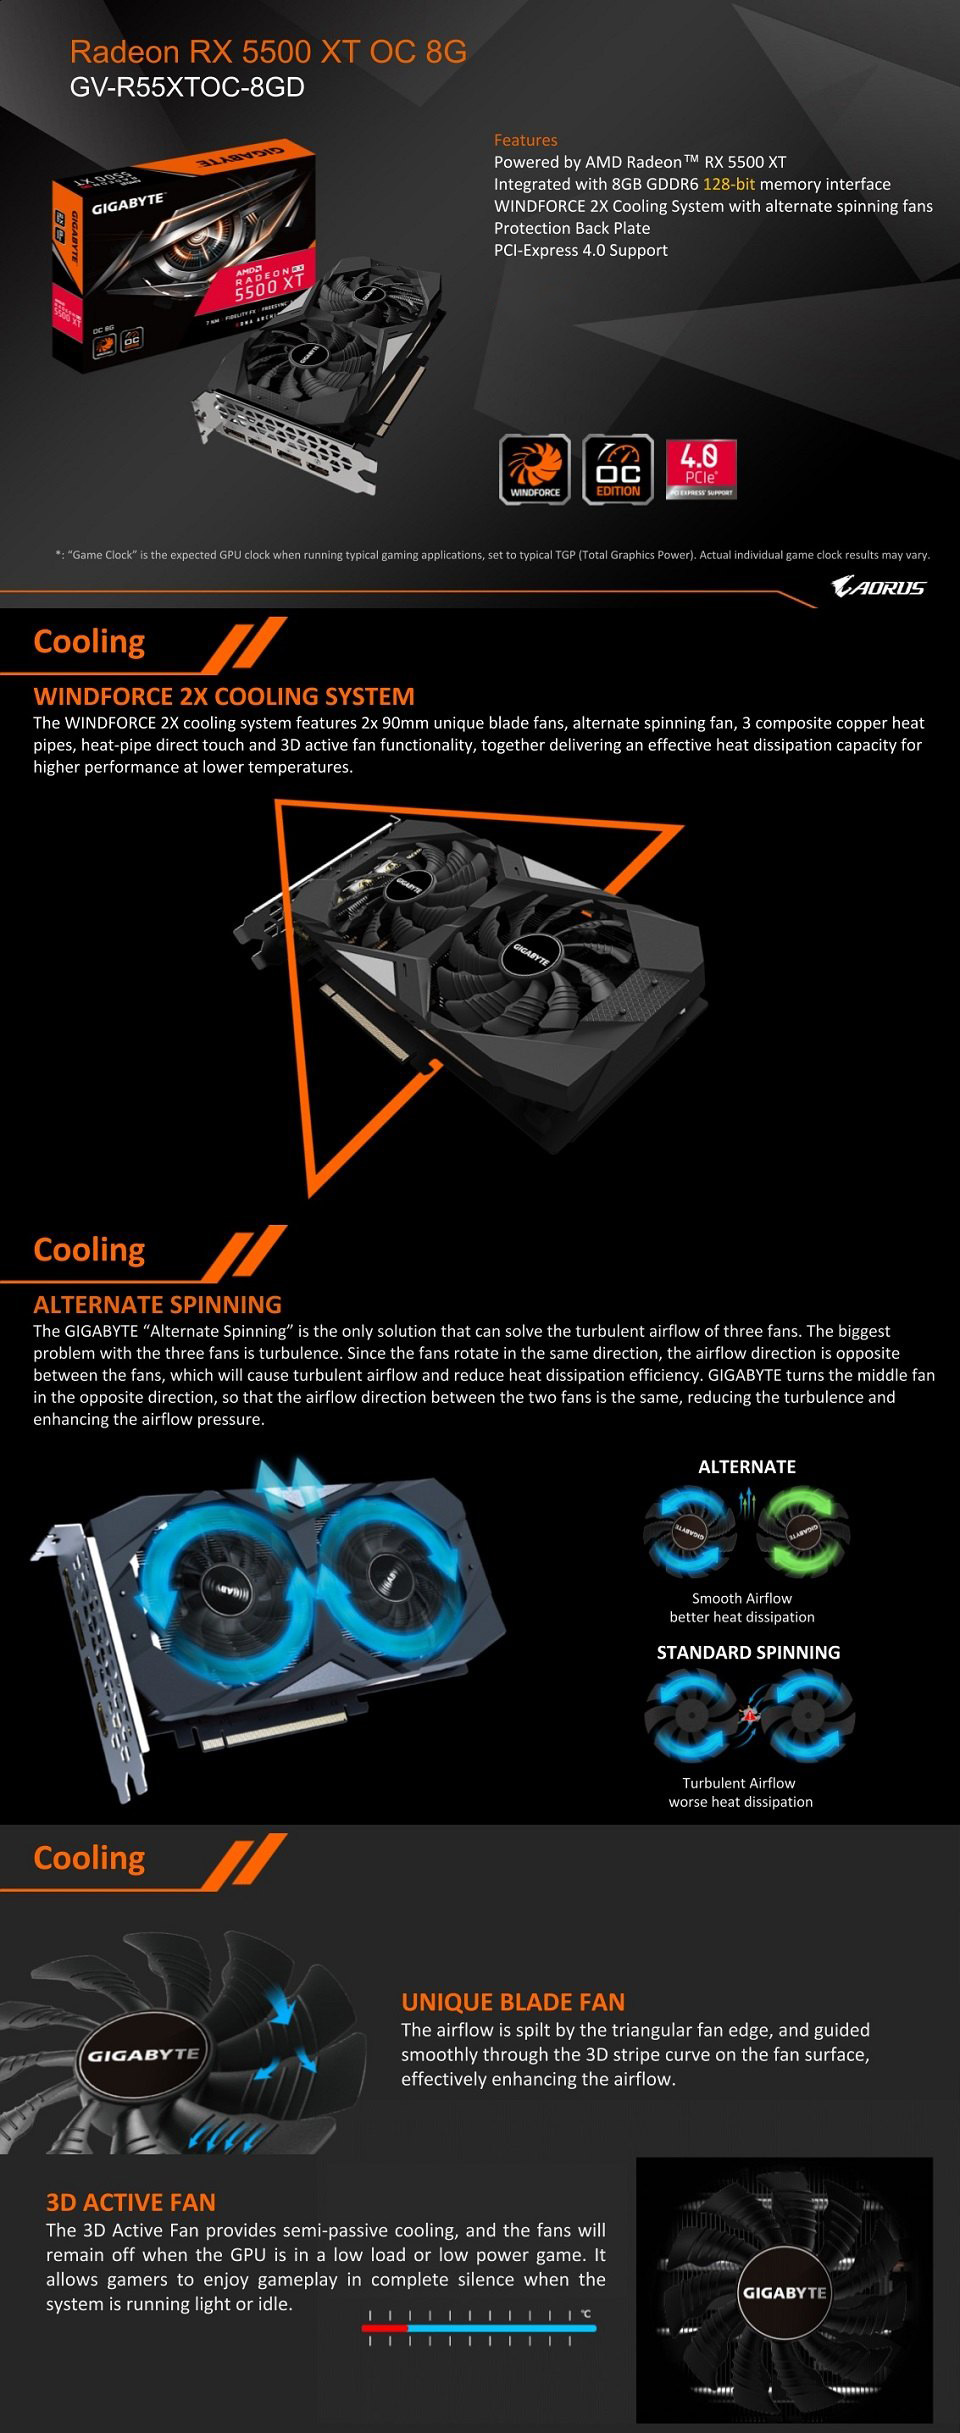 Gigabyte Radeon RX 5500 XT OC 8GB features